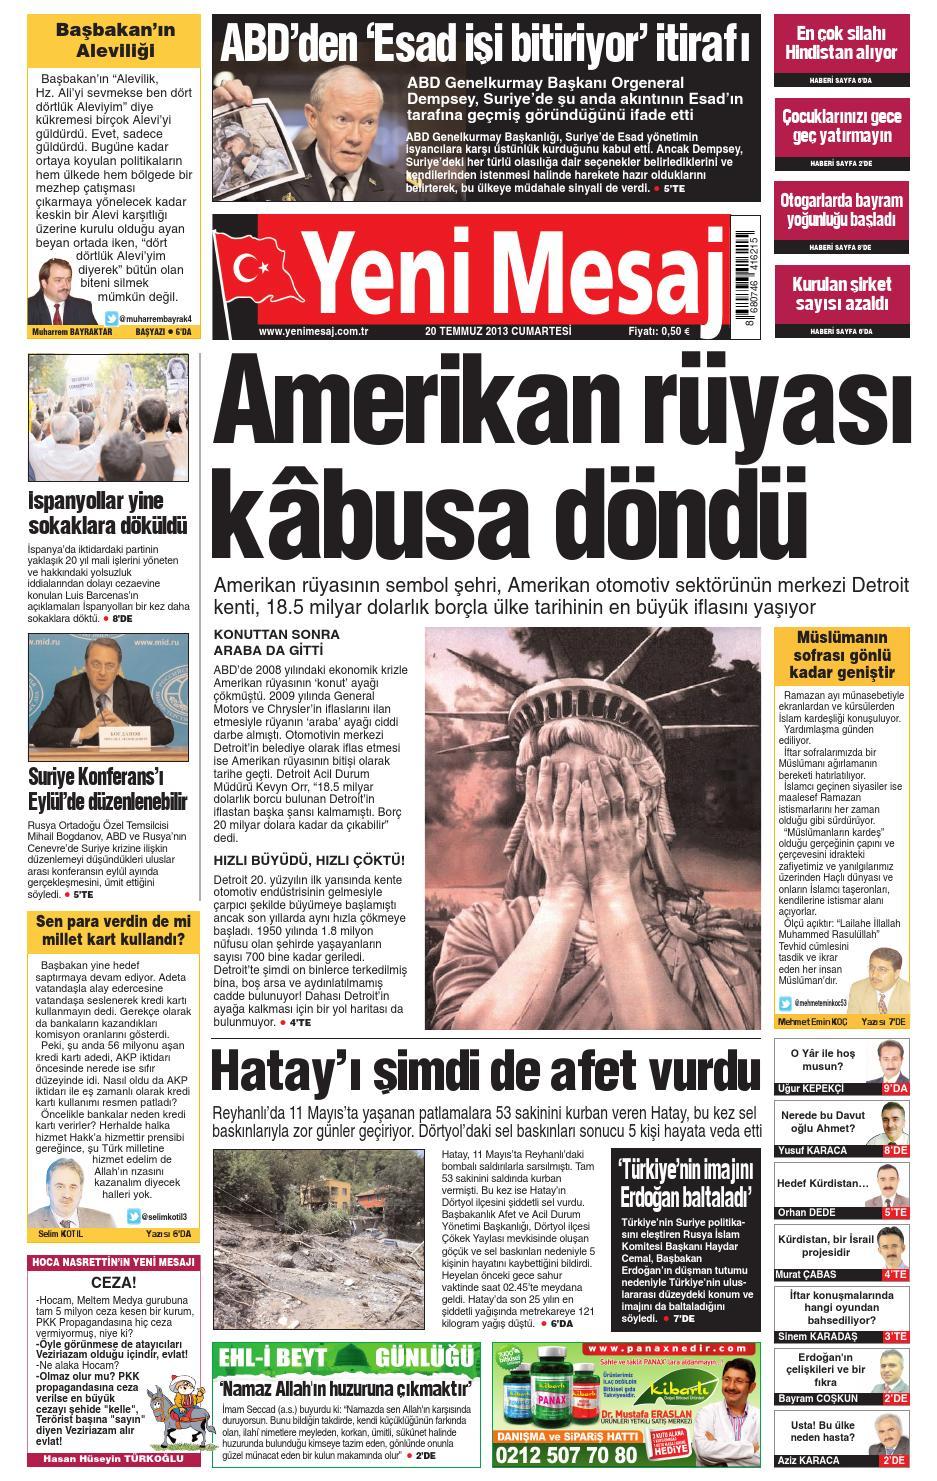 Yeni Mesaj Gazetesi Avrupa 20 Temmuz 2013 By T C Ali Asa Issuu